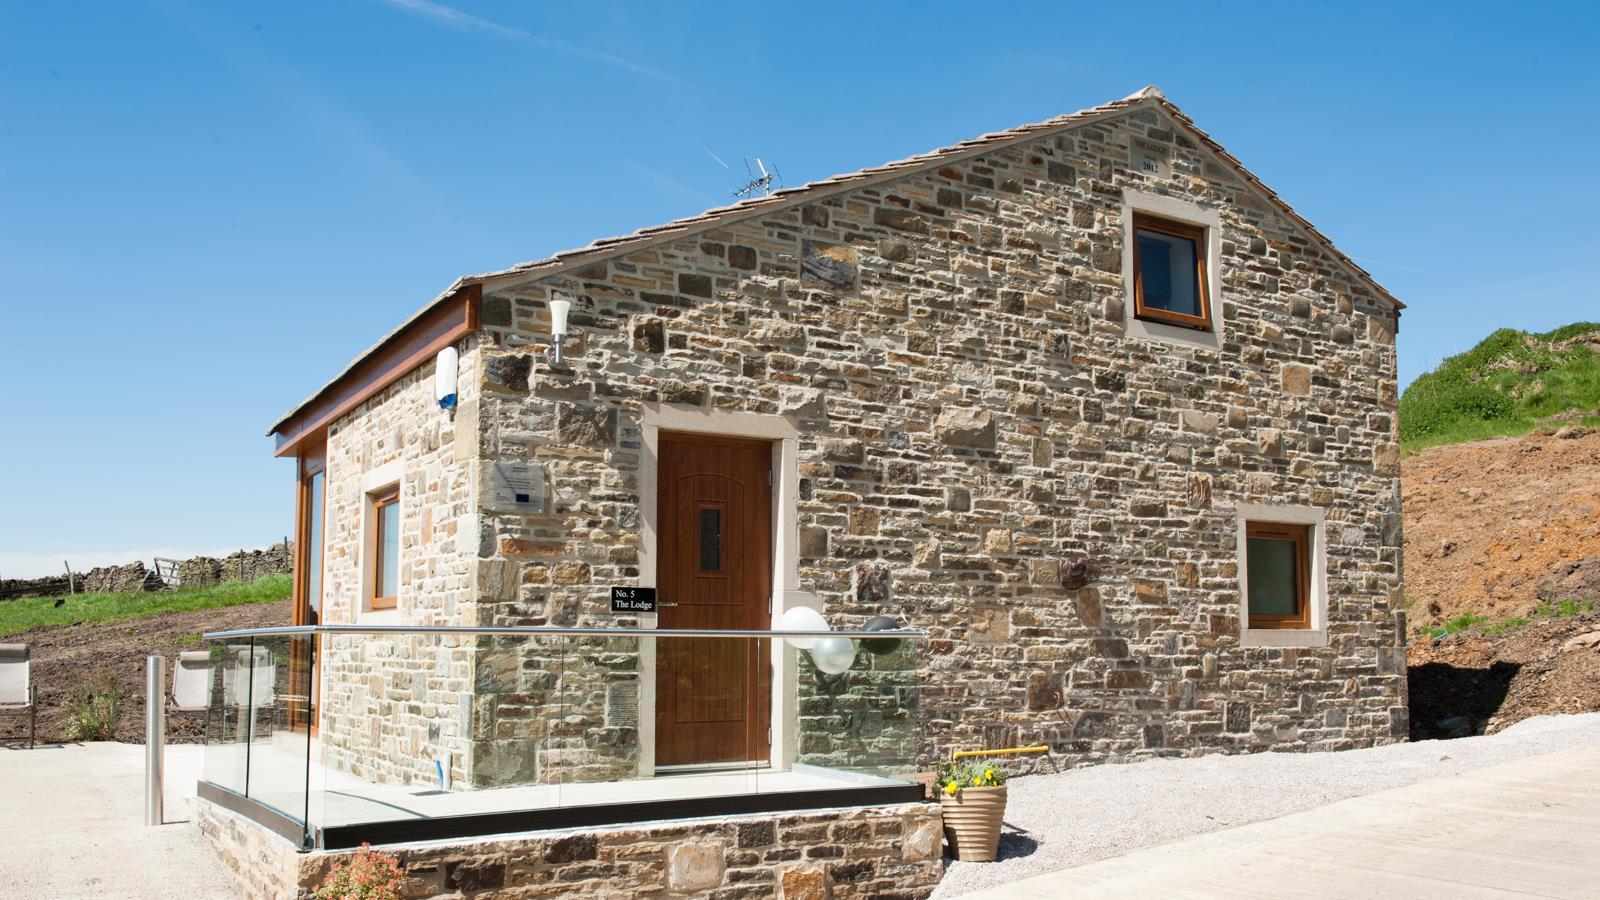 Picture of Parrock Lumb Cottages